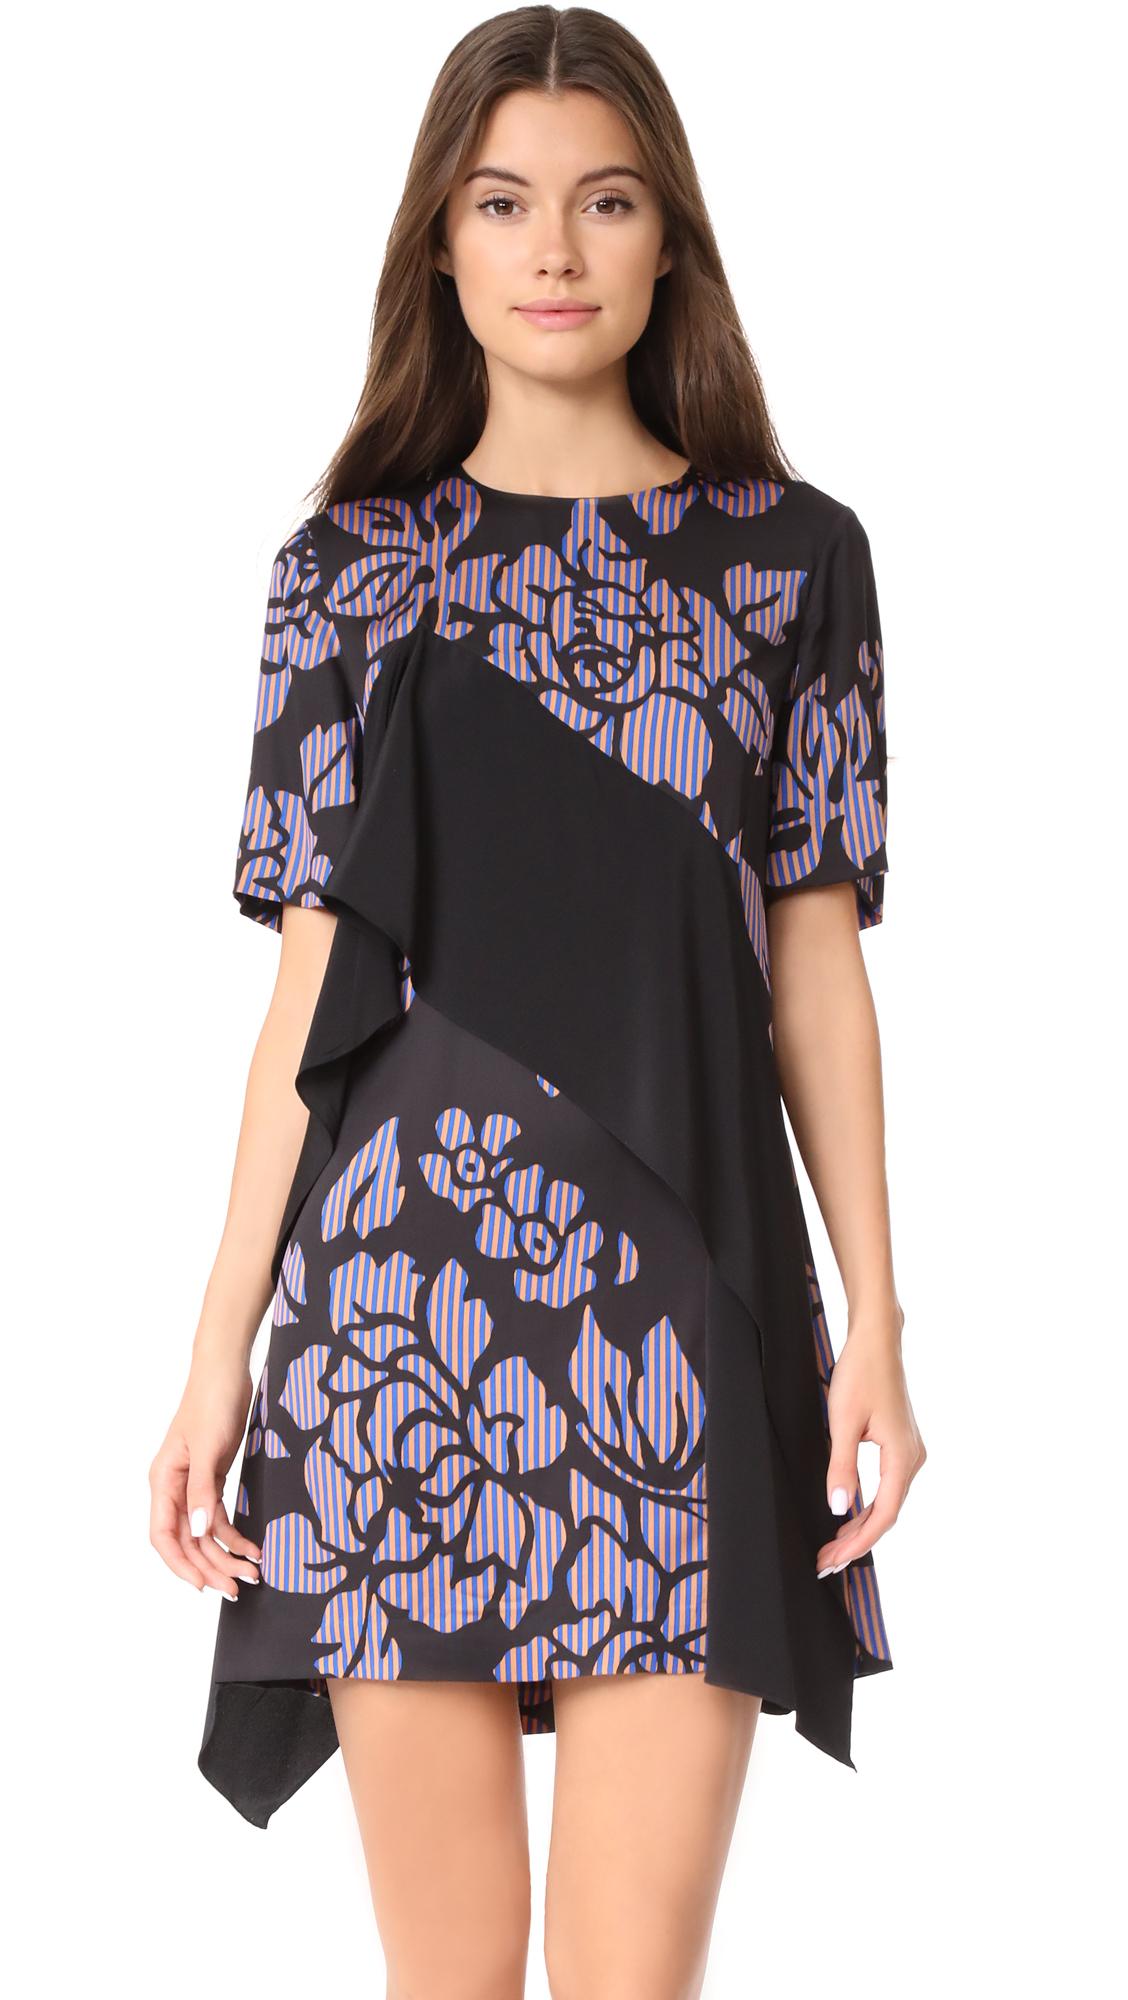 Diane von Furstenberg Short Sleeve Ruffle Front Mini Dress - Bennett Black/Black